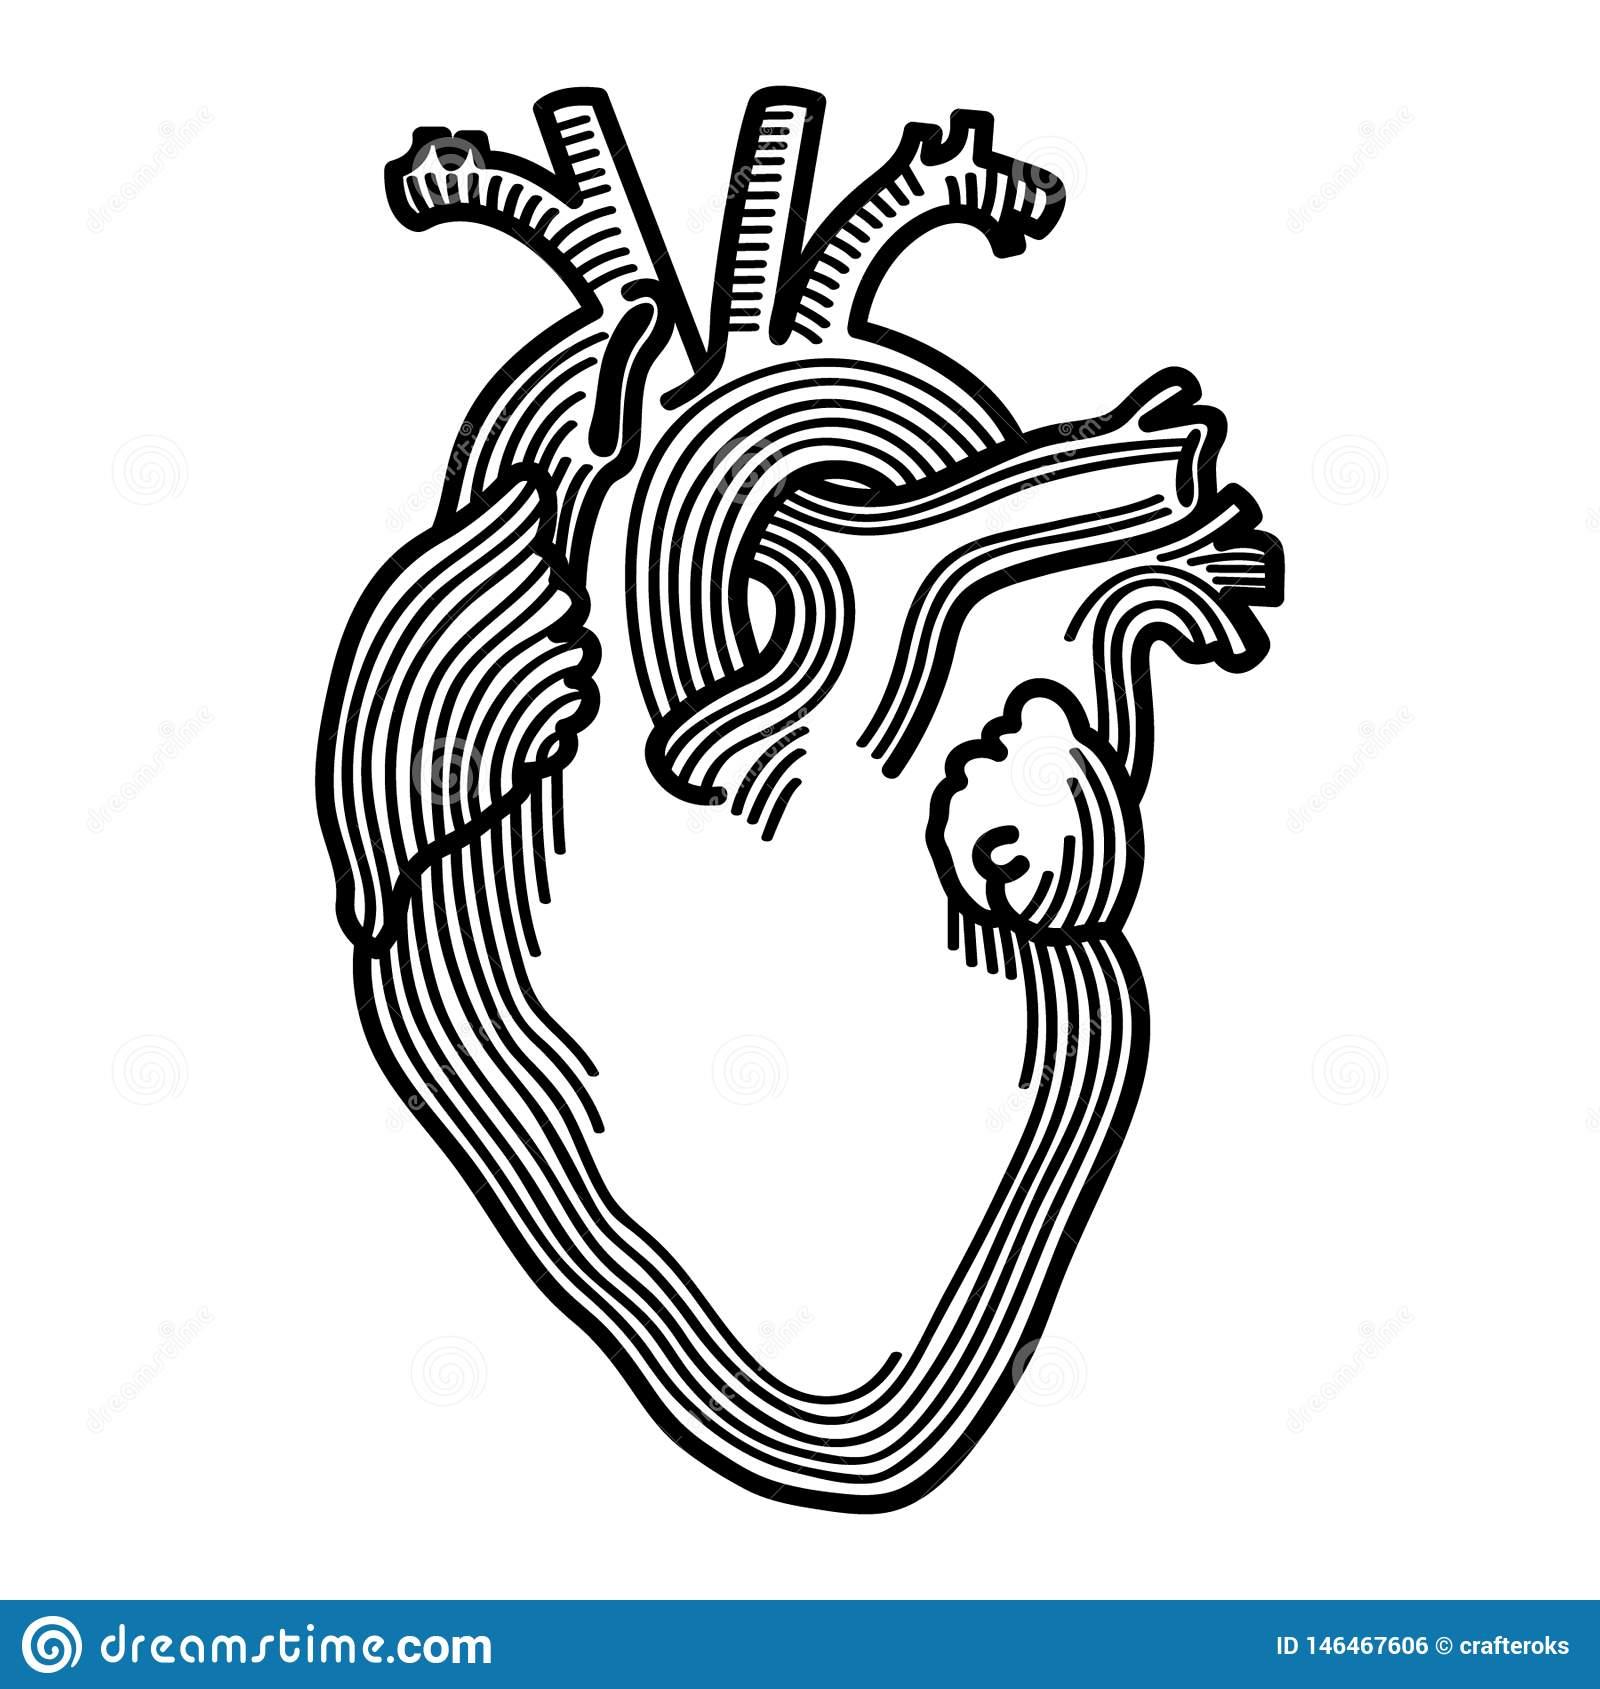 Anatomical Heart Hand Drawn Crafteroks Svg Free, Free Svg File, Eps.